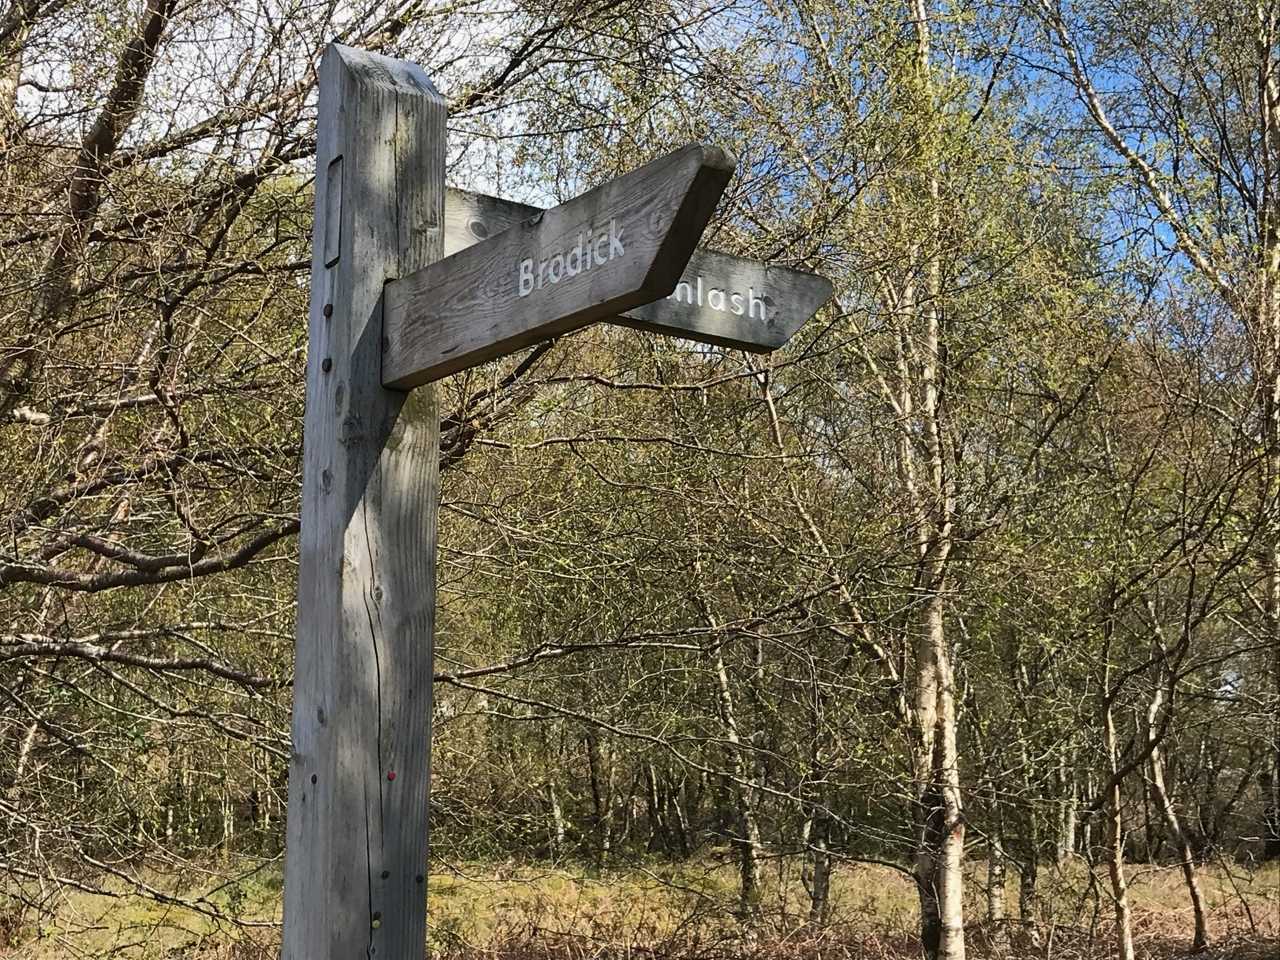 Footpaths to Lamlash & Brodick